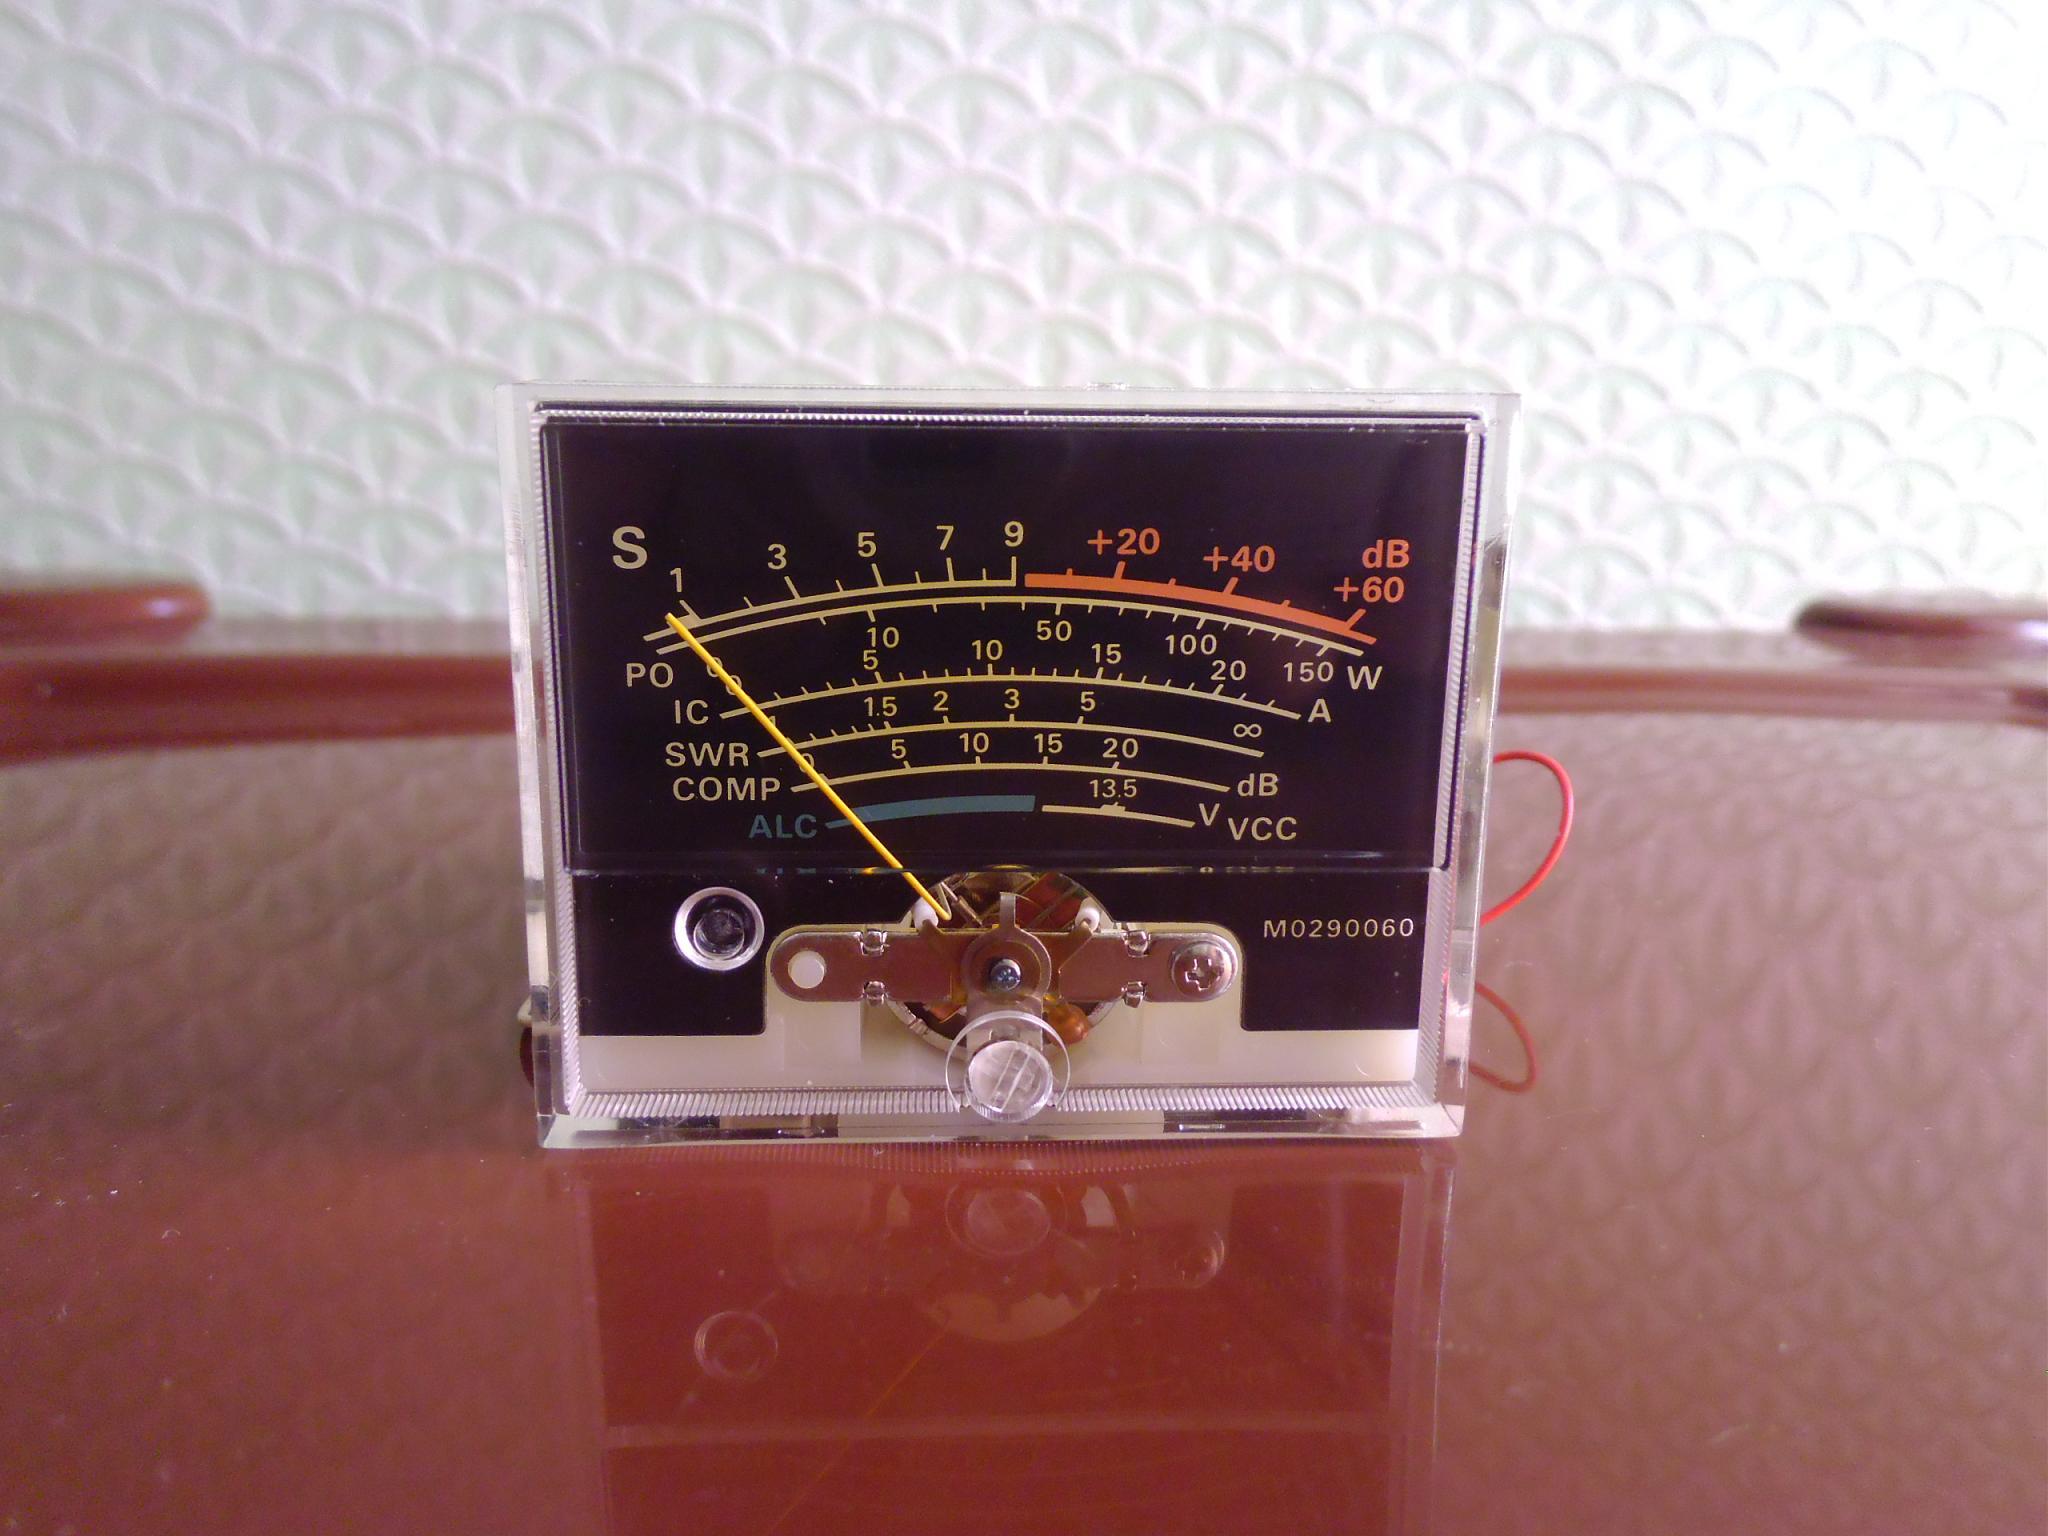 FT-990 - CQHAM.RU Обзоры радиоаппаратуры